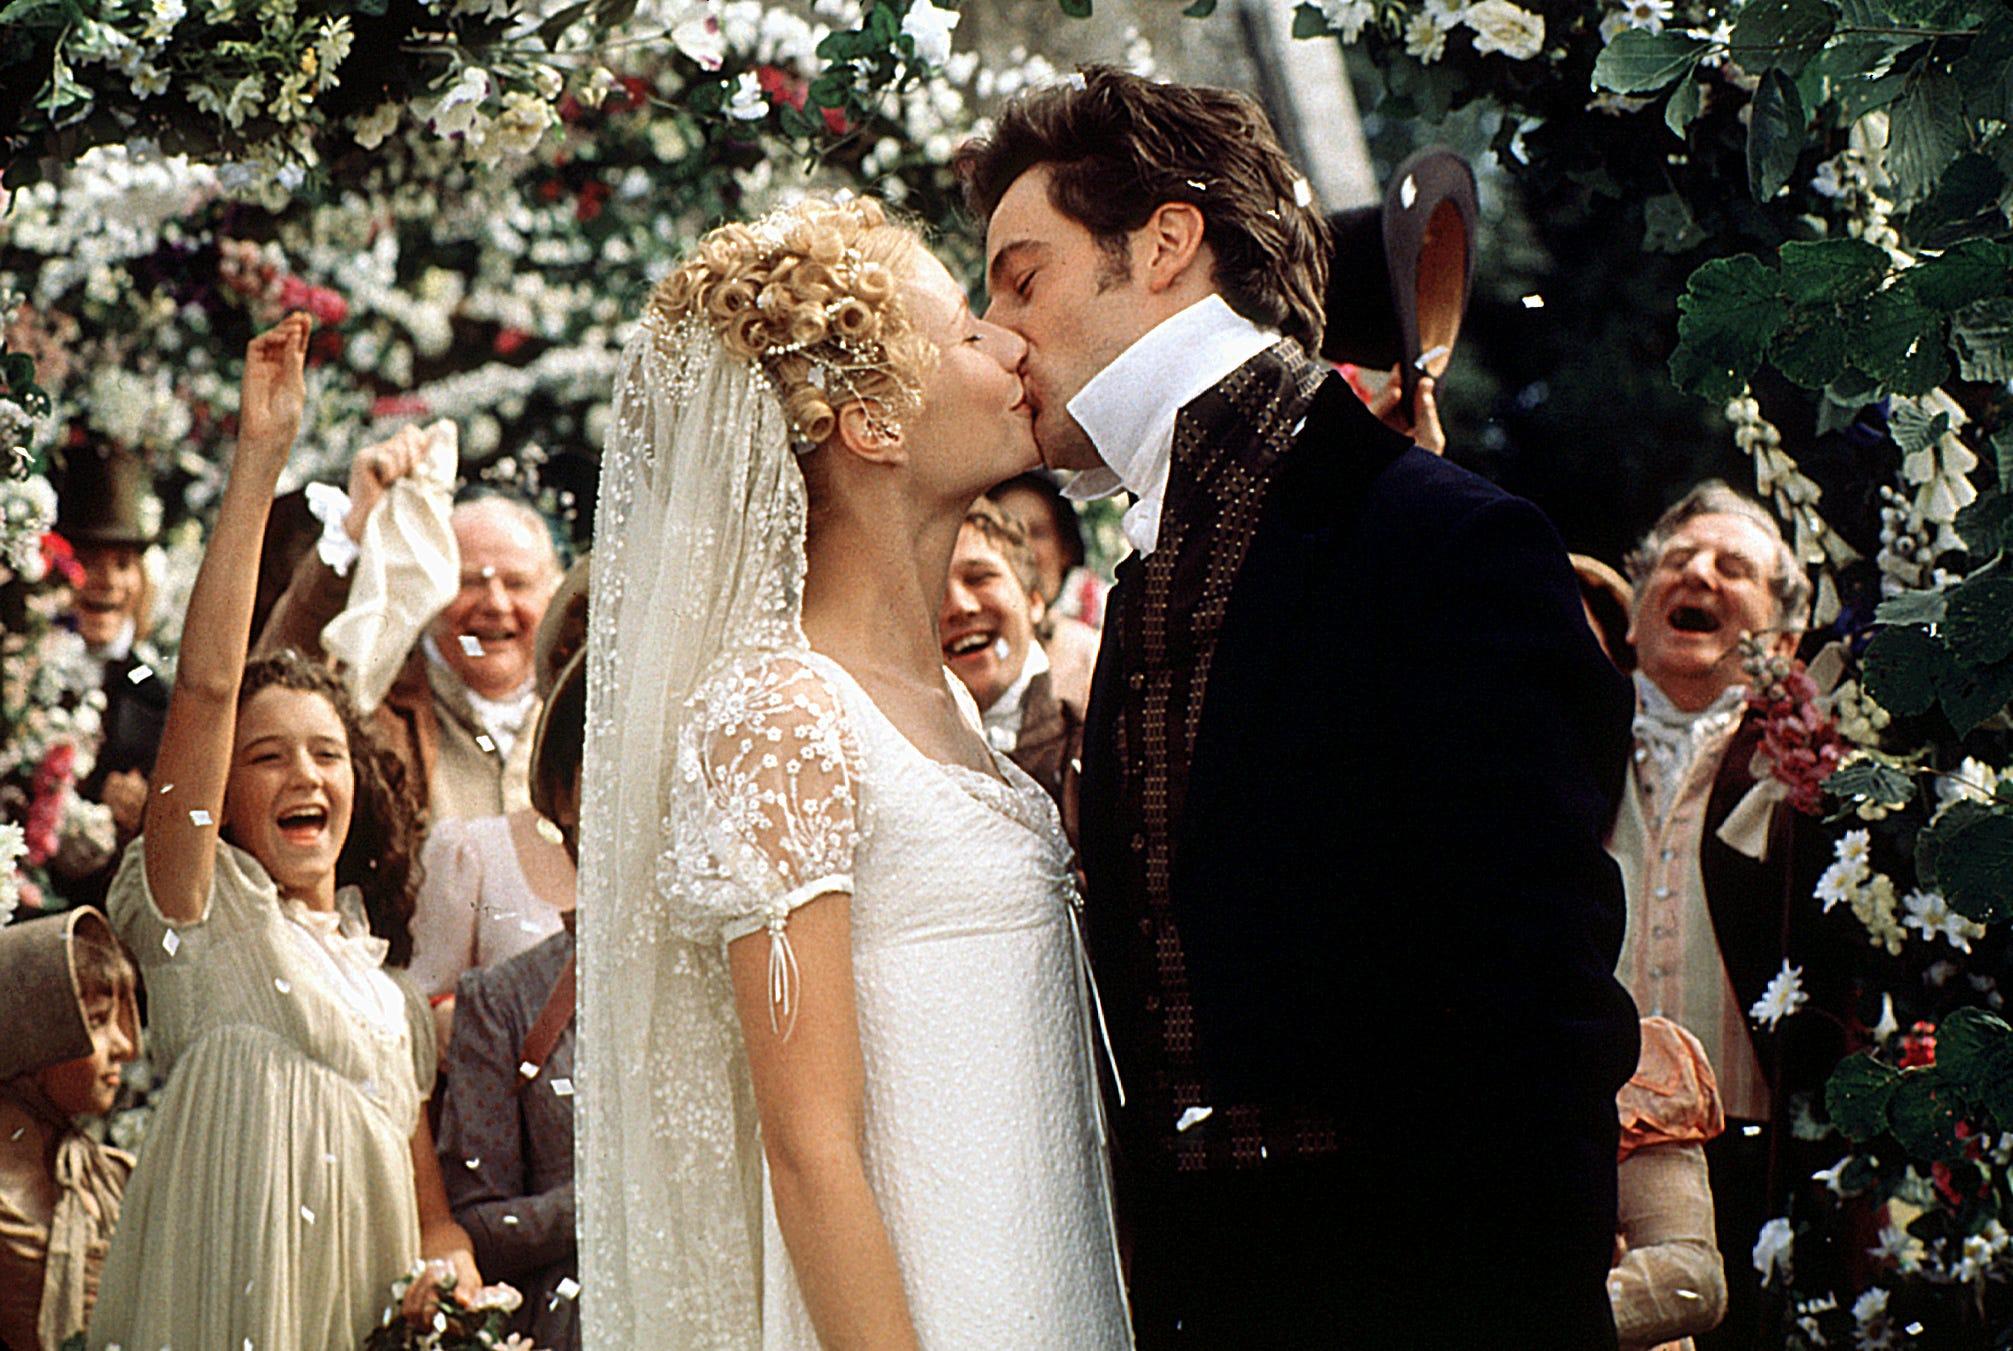 Gwyneth Paltrow s  Emma  turns 25: Celebrate with 7 swoon-worthy Jane Austen-inspired films